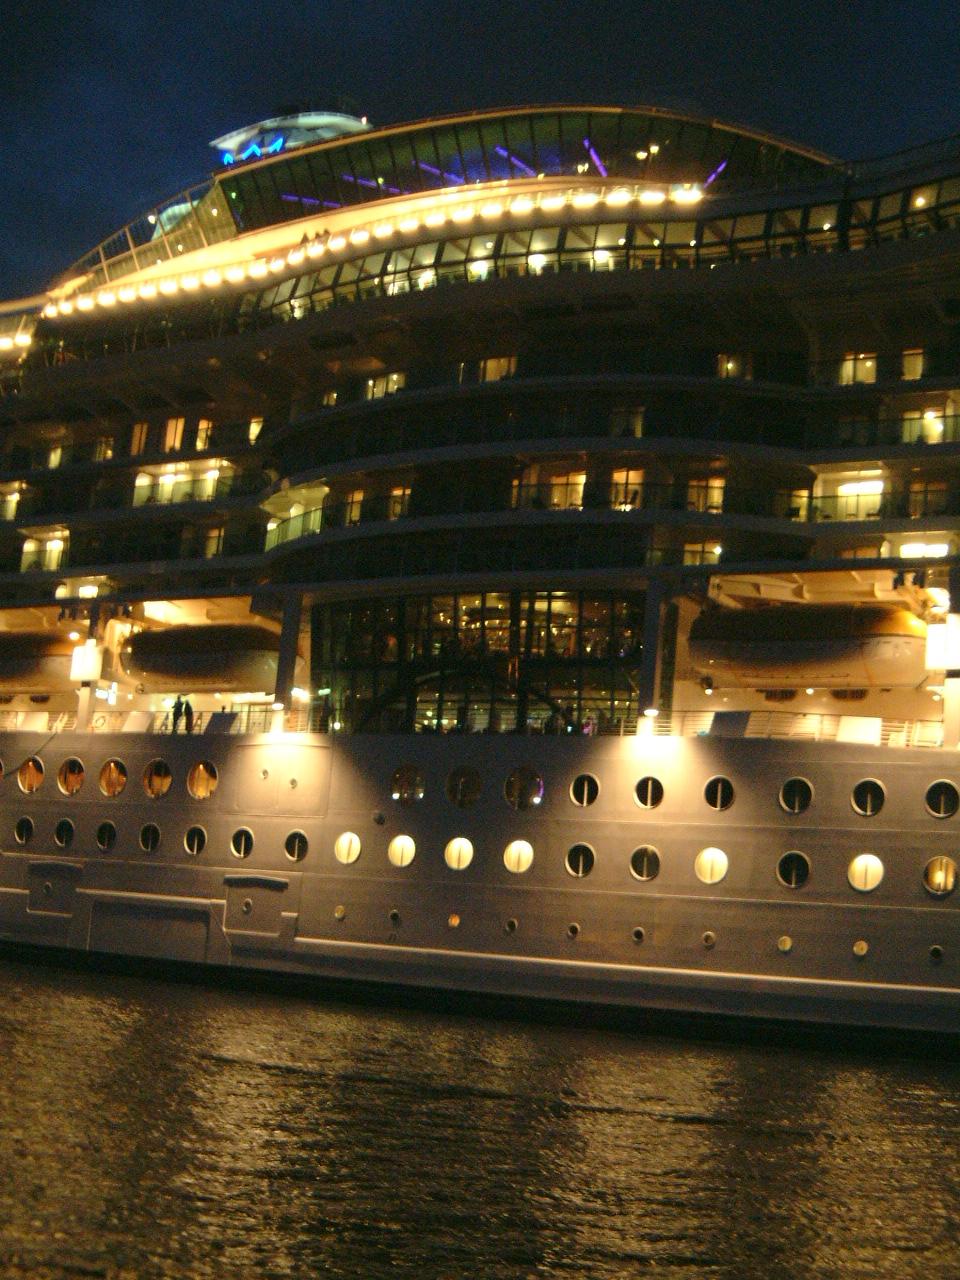 maartent cruise liner ship vacation holiday night lights recreation